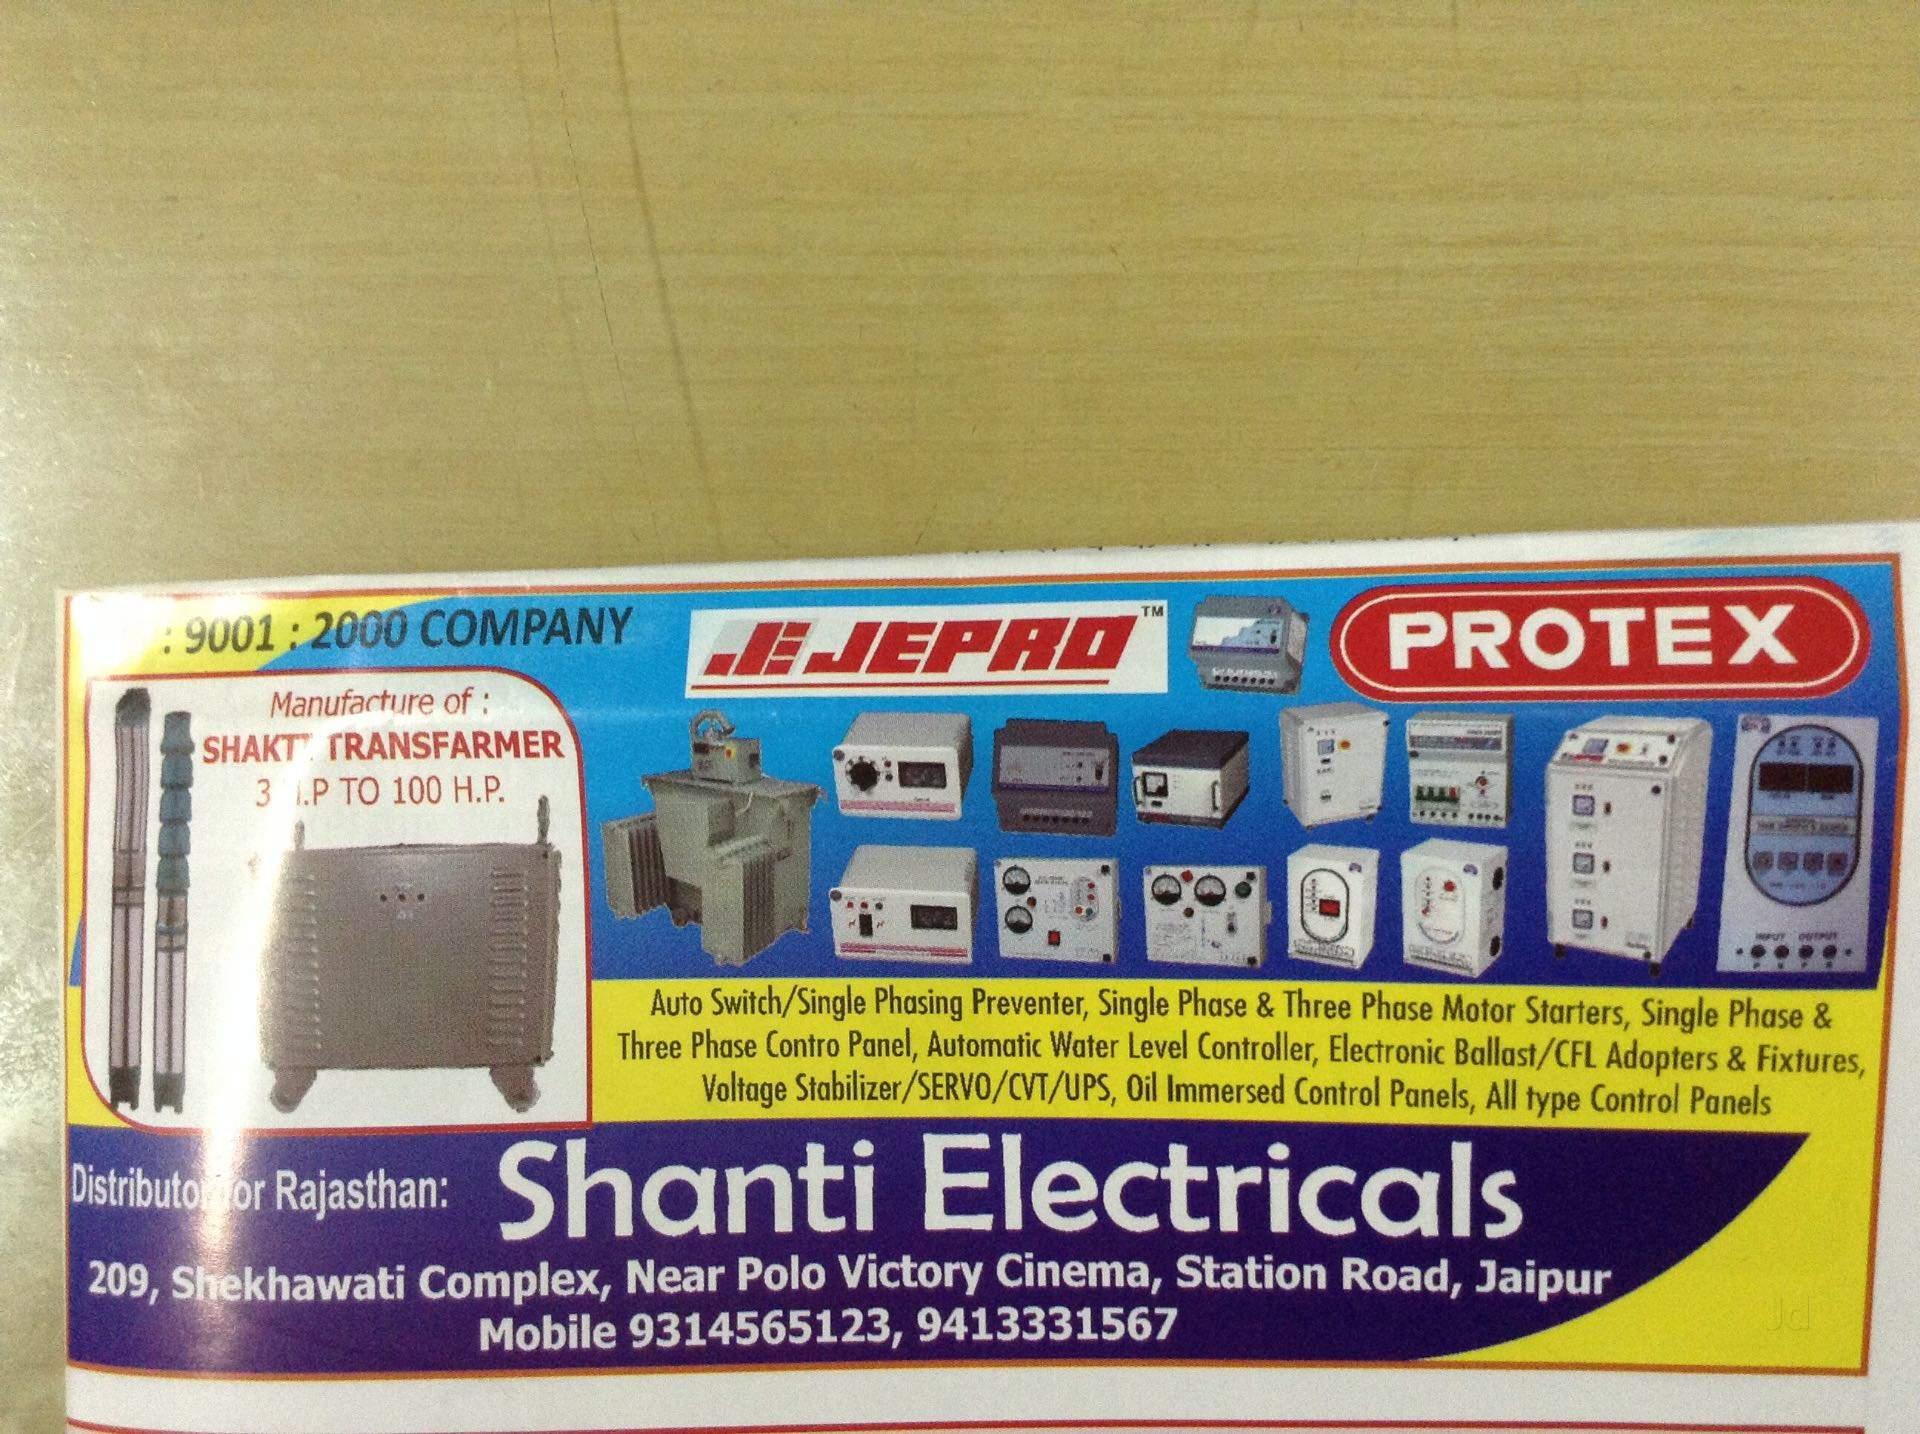 Top 100 Electrical Goods Wholesalers in Jaipur - Justdial